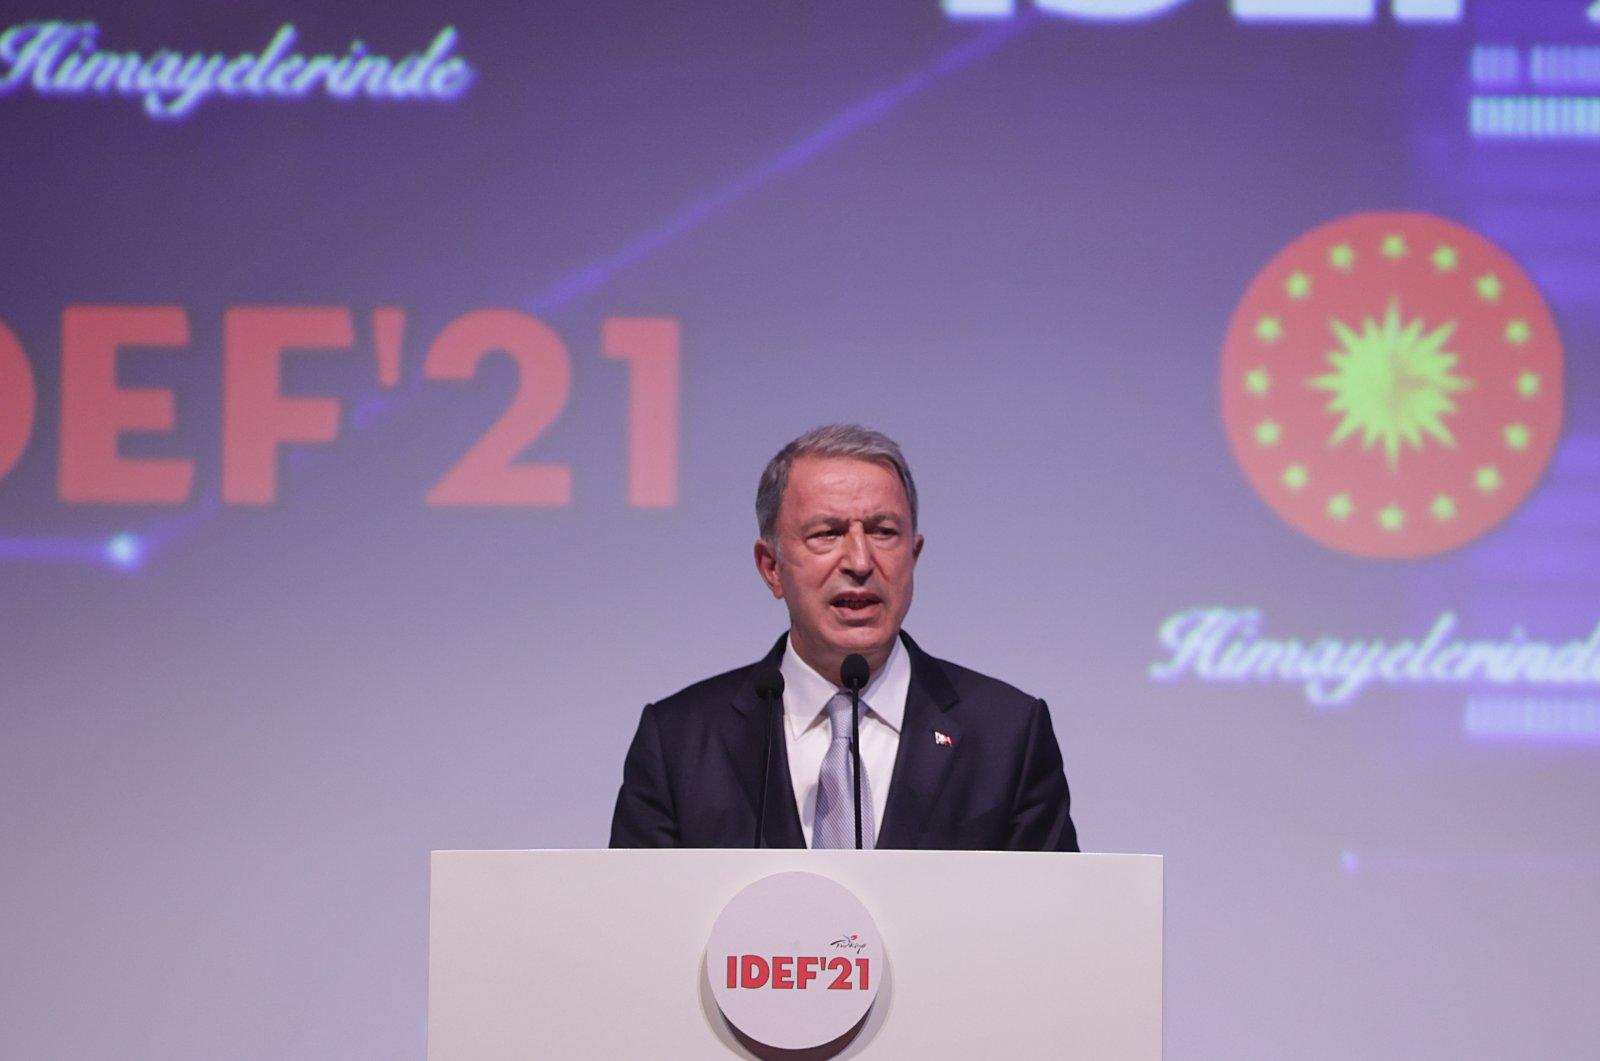 Defense Minister Hulusi Akar speaks at the International Defense Industry Fair (IDEF 2021) in Istanbul, Turkey, Aug. 17, 2021. (AA Photo)